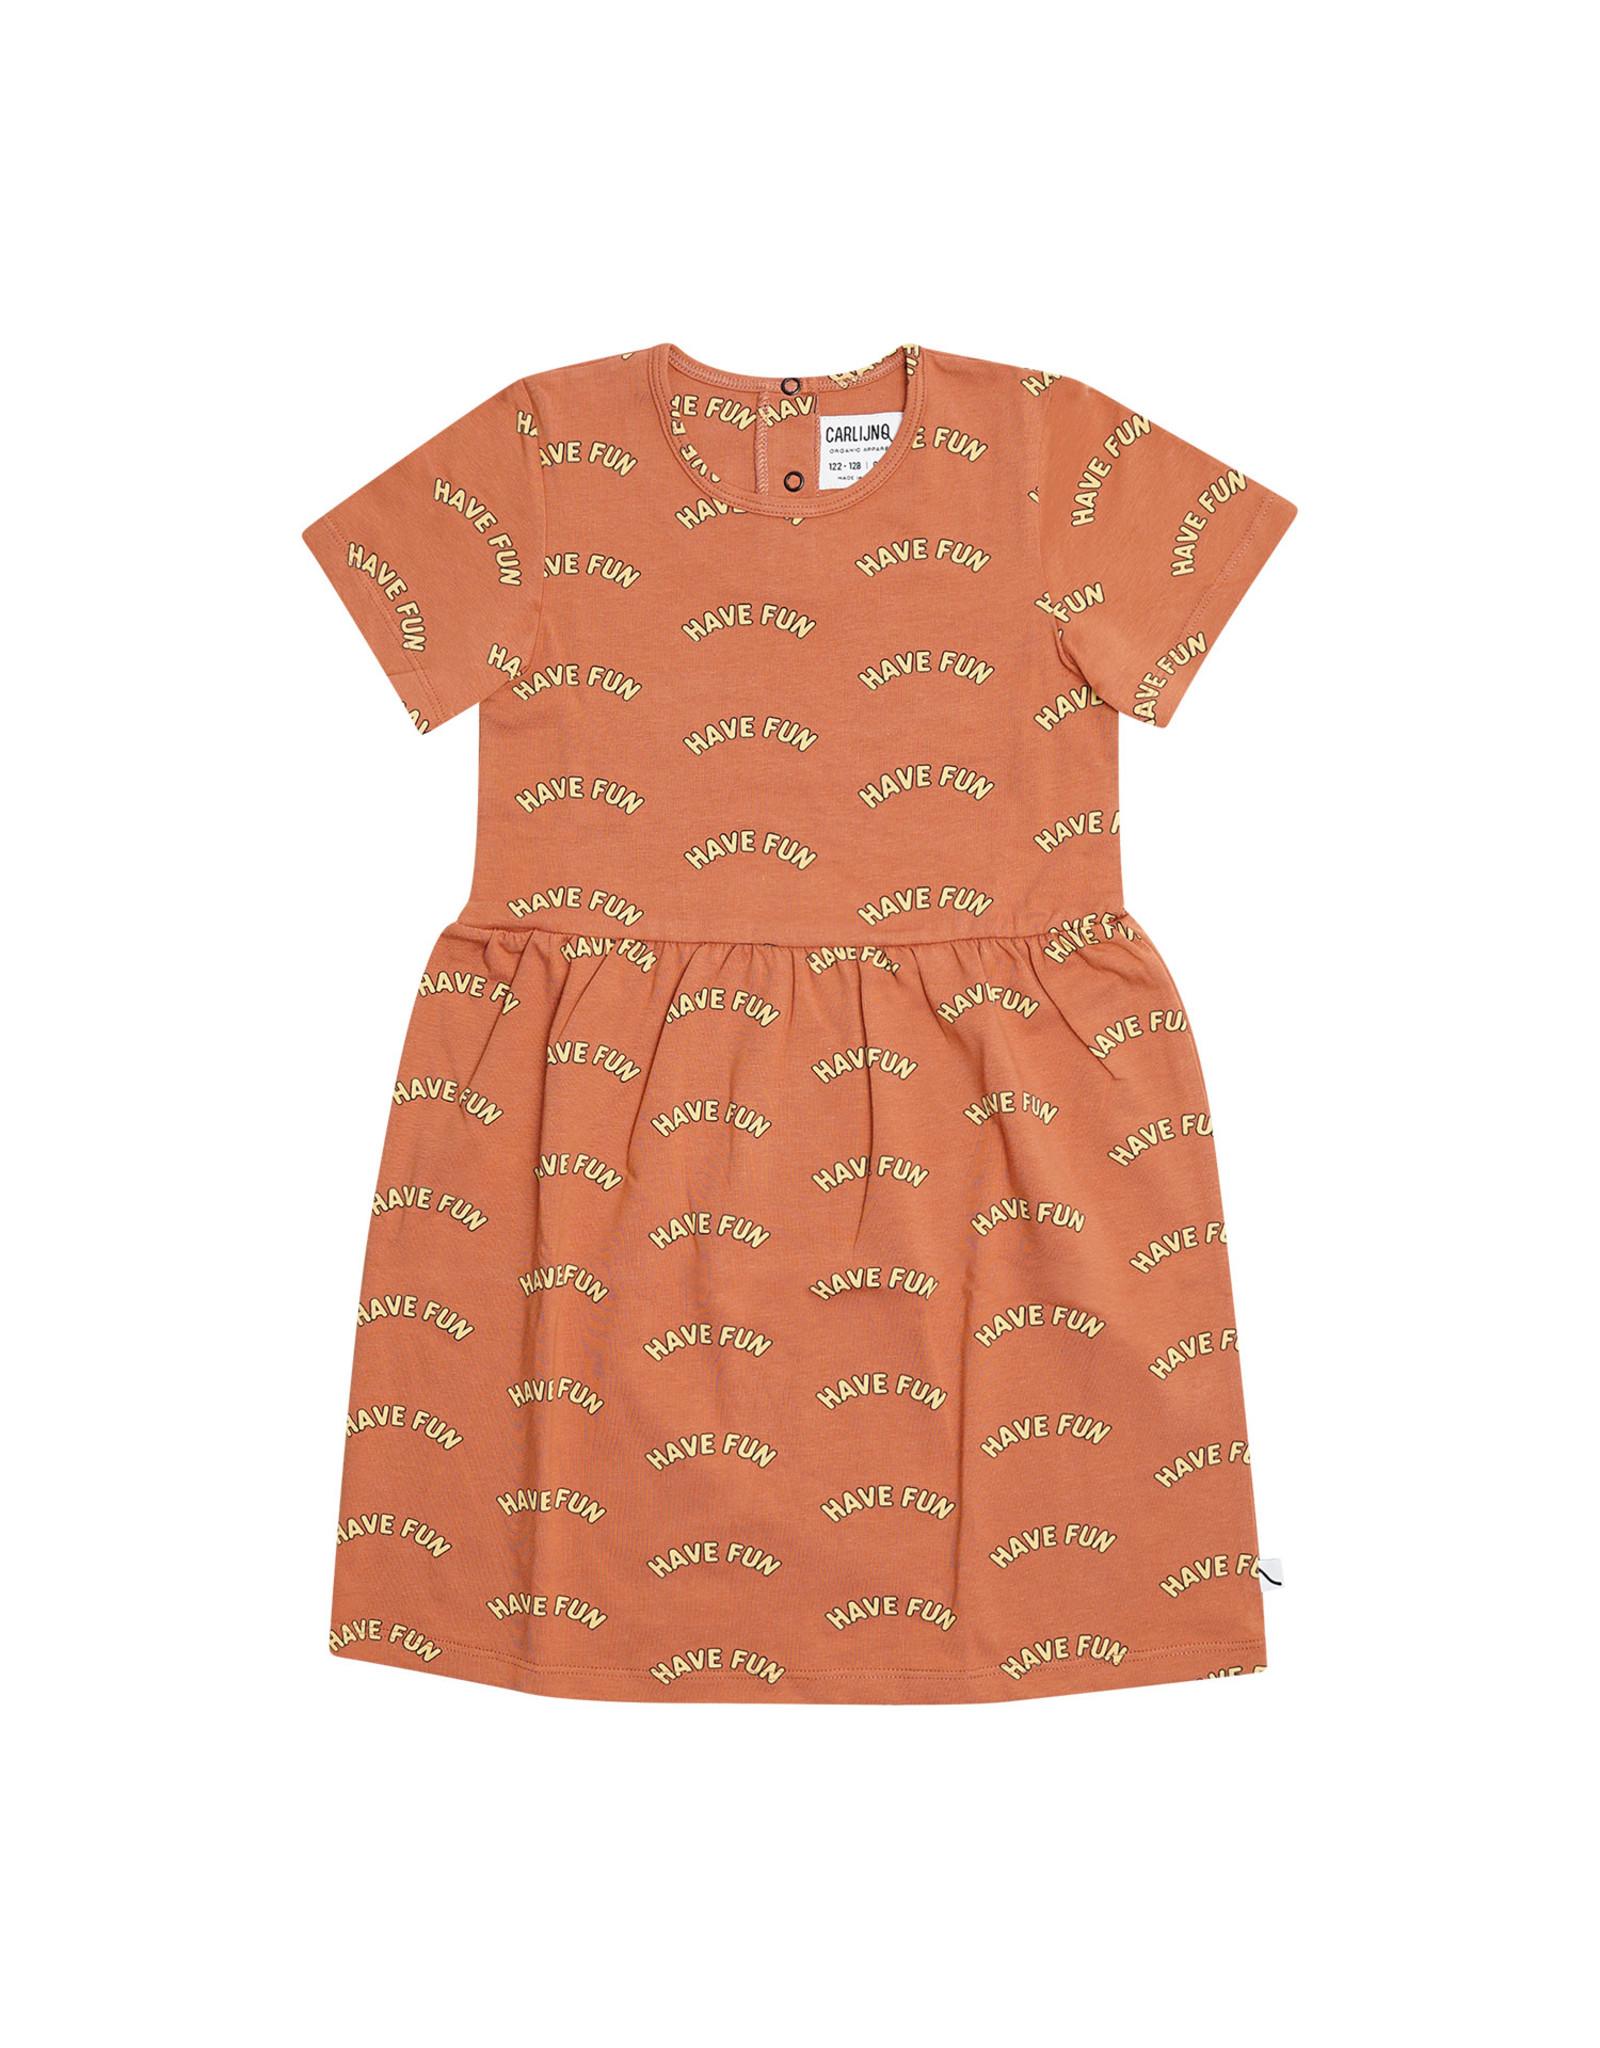 Carlijn Q Carlijn Q Have Fun - Dress Short sleeves